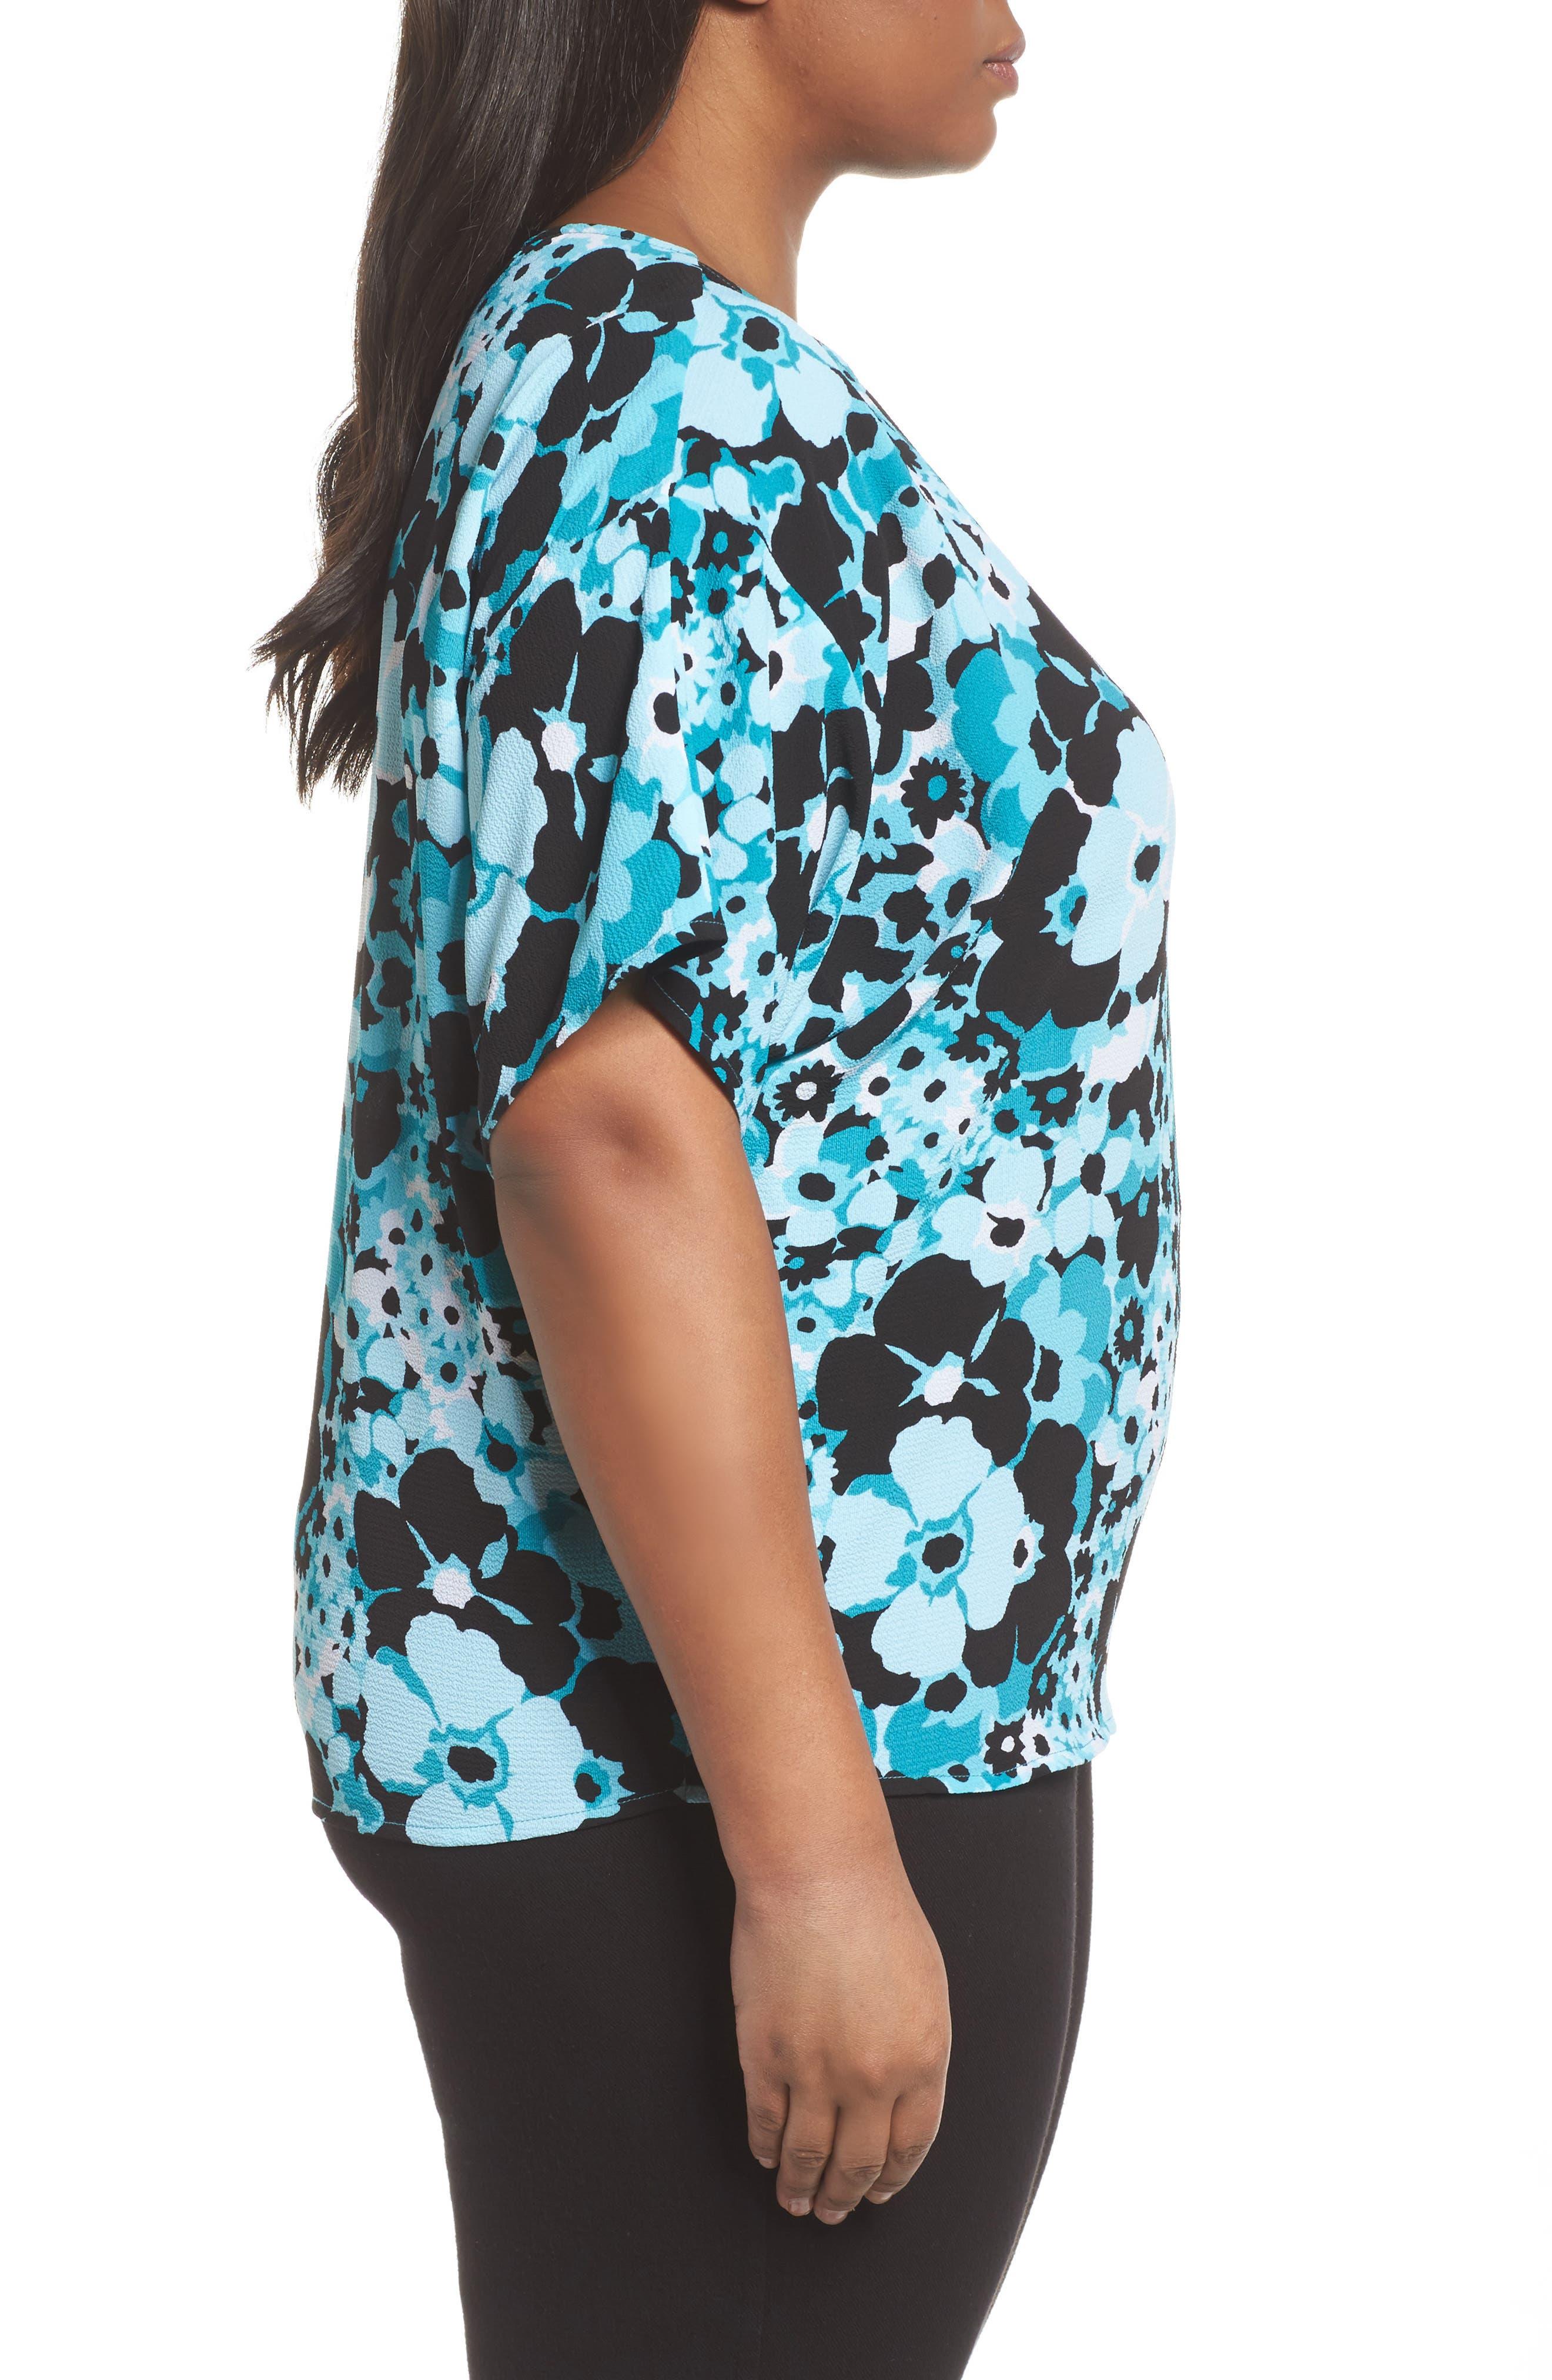 Spring Side Tie Crepe Top,                             Alternate thumbnail 3, color,                             Tile Blue/ Black Multi